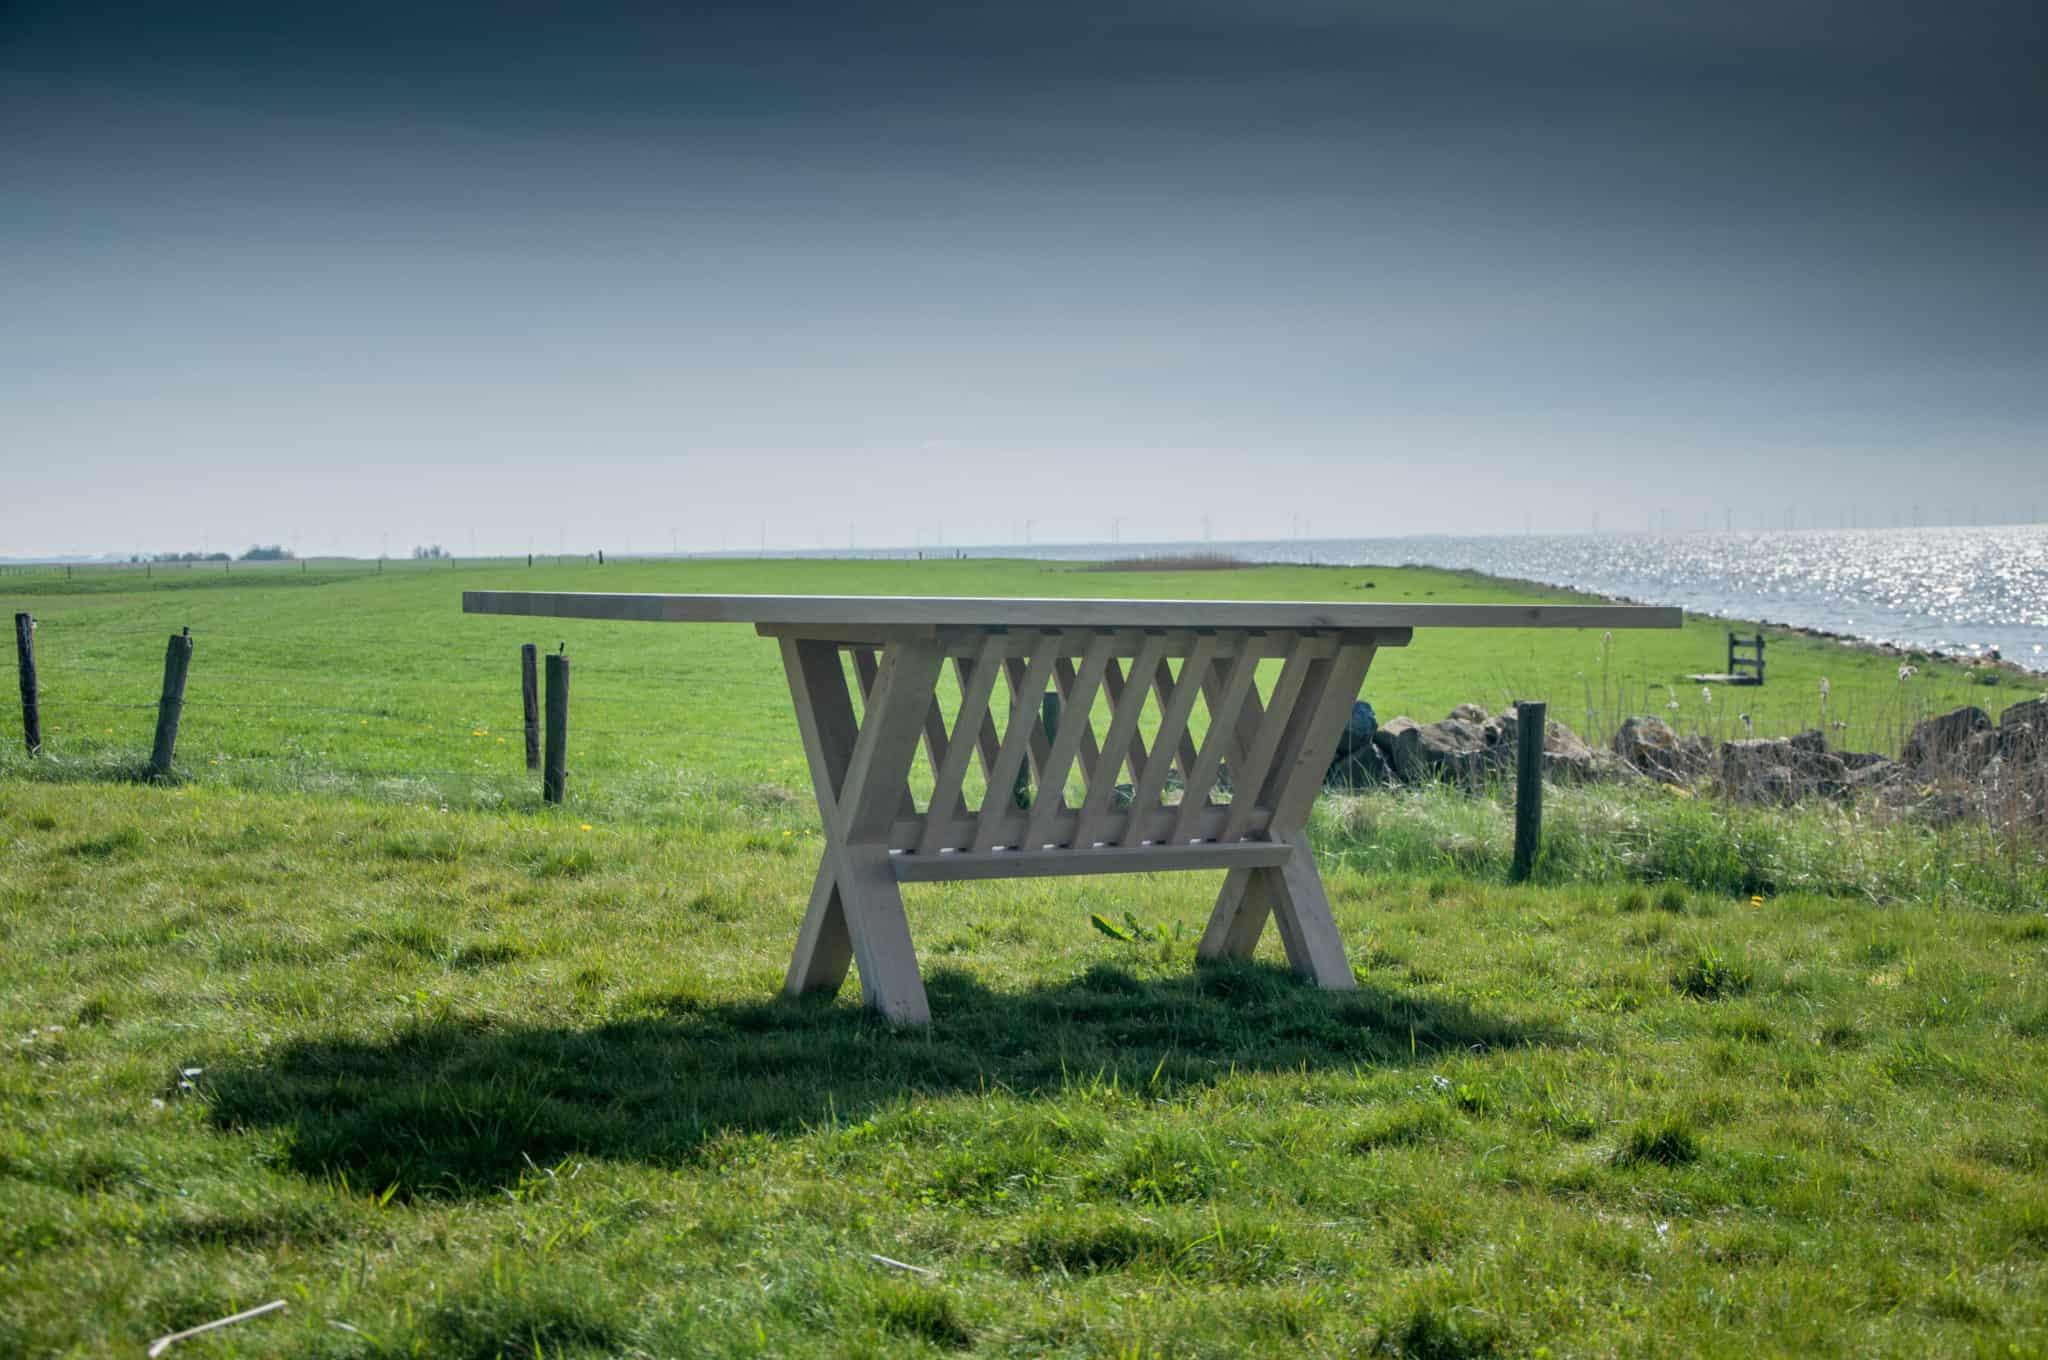 Massief eiken houten eikenhouten rechte rechthoek eetkamer keuken tafel tafels